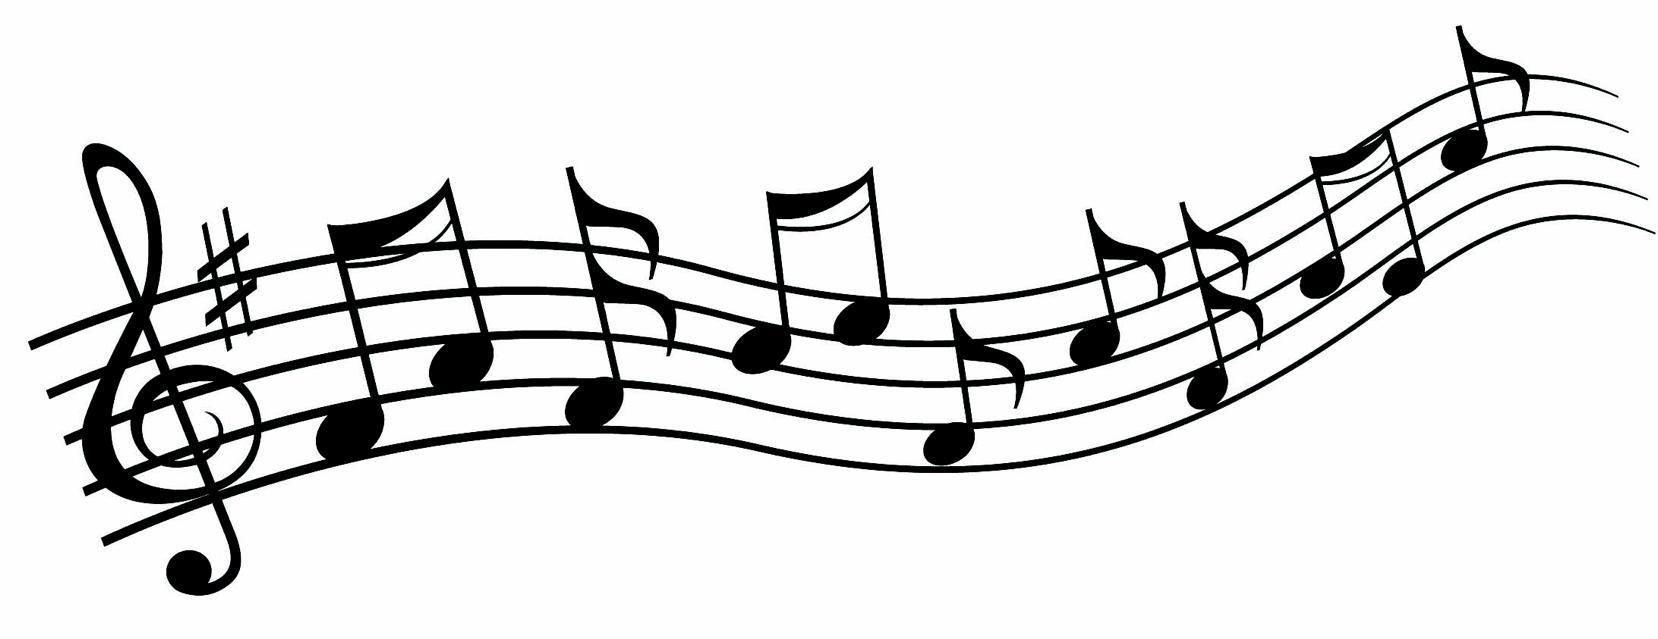 Music Sheet Music Tattoos Music Clipart Music Notes